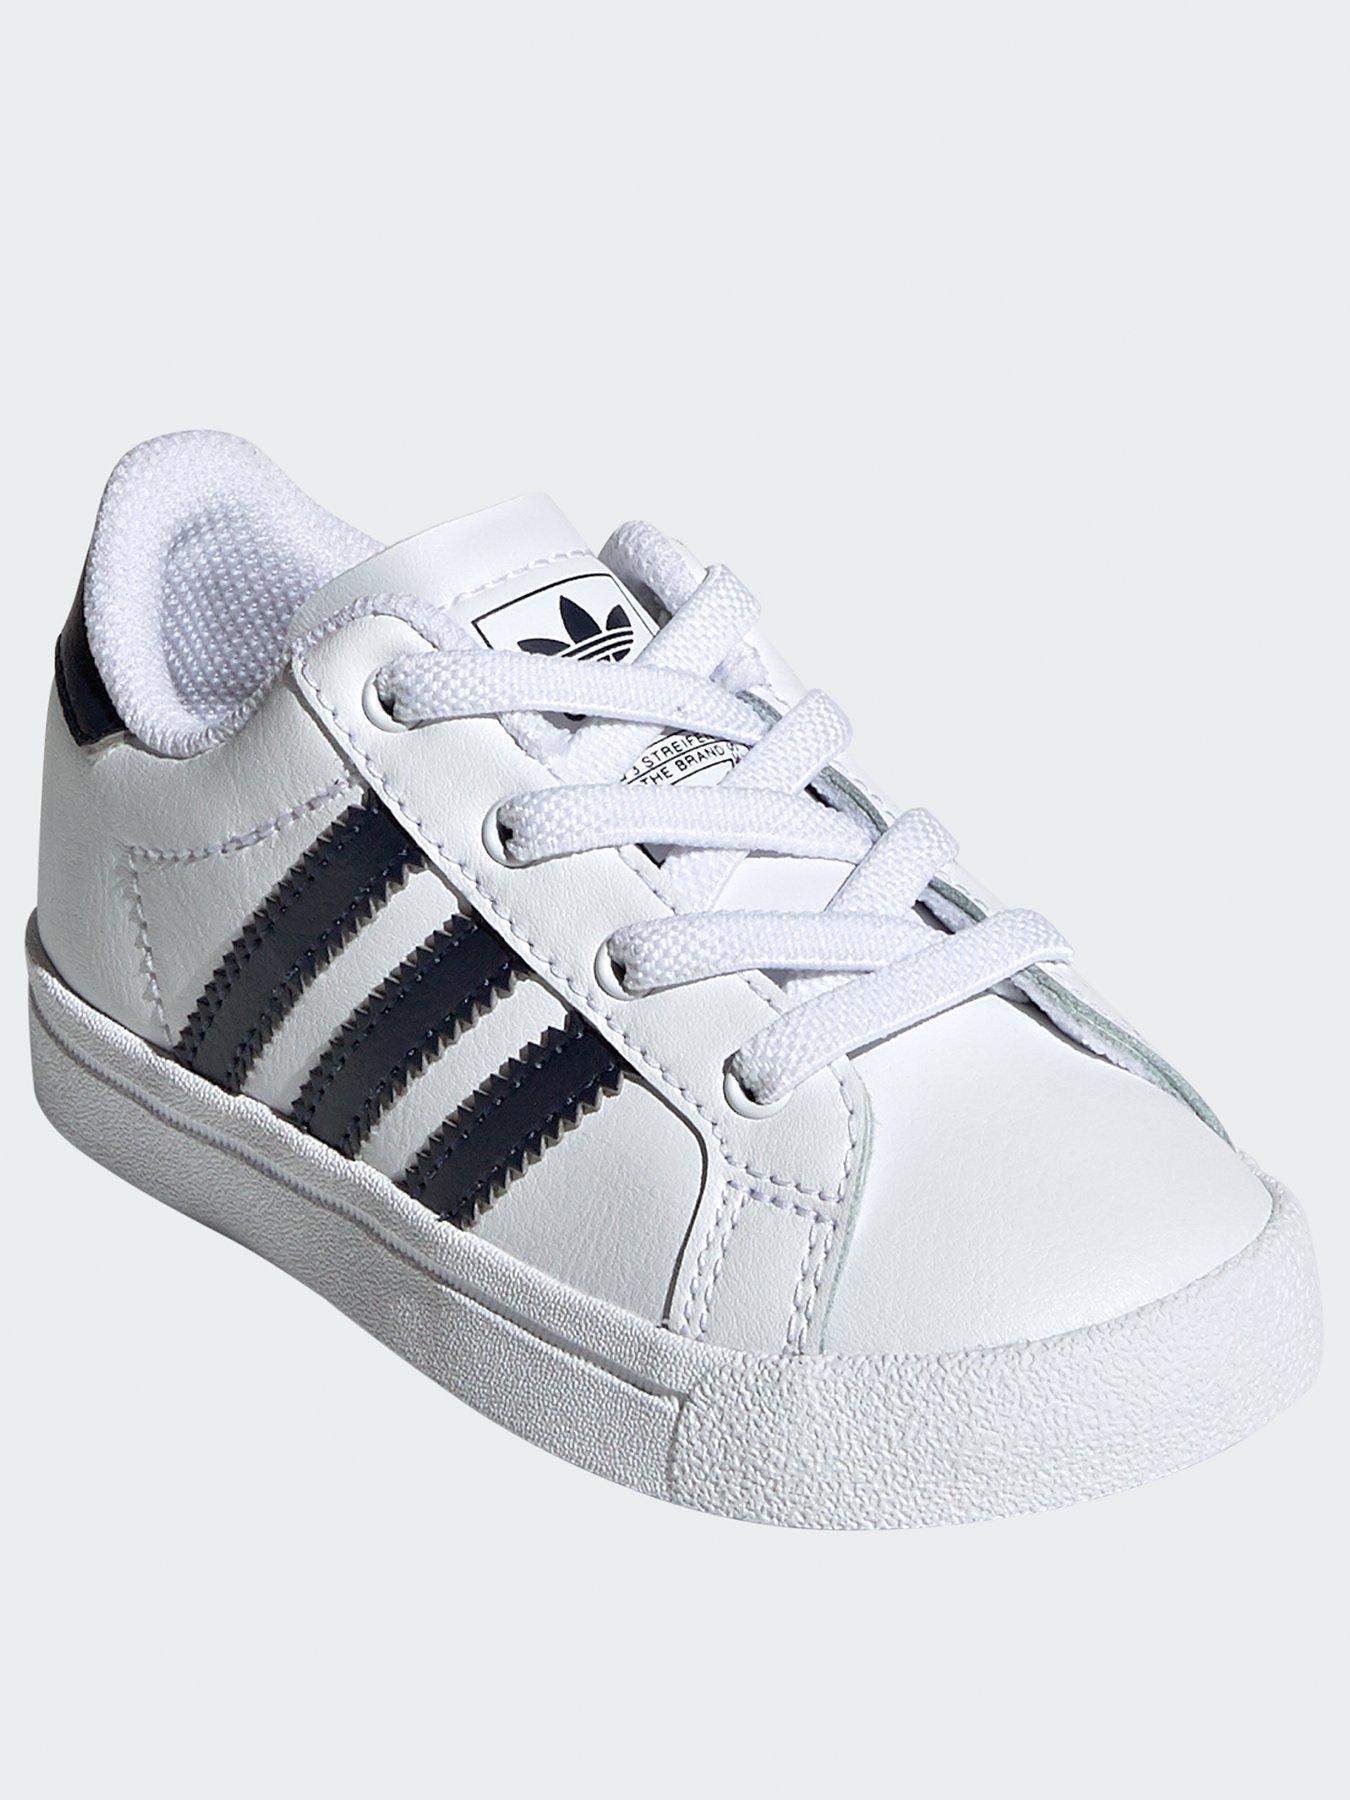 jd sports infant vans Sale,up to 61